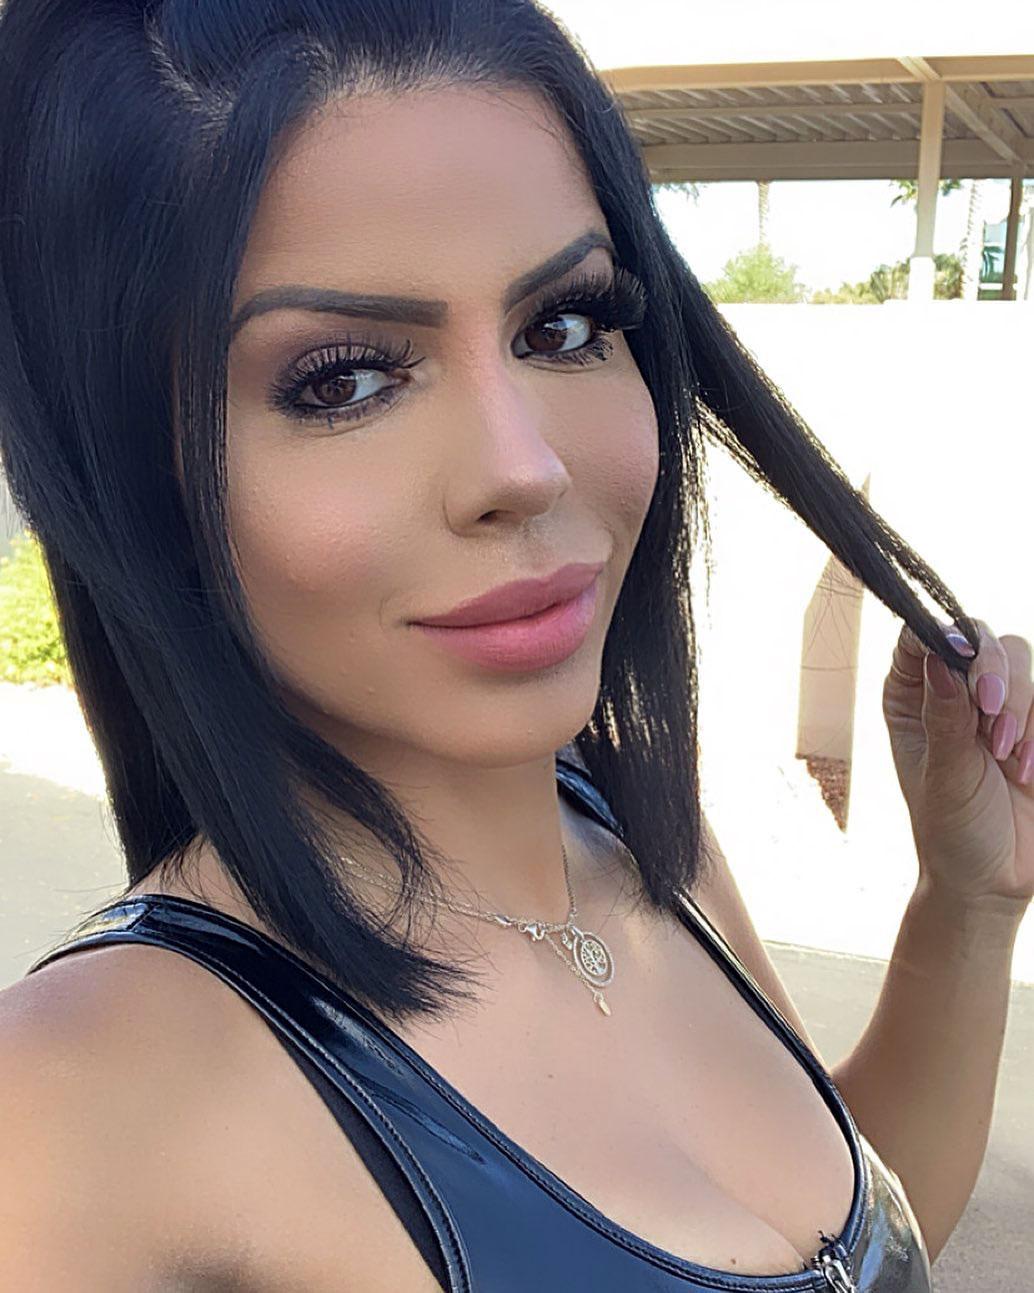 90 Day Fiance 90DF Larissa Lima Feels Accomplished After Criminal Assault Case